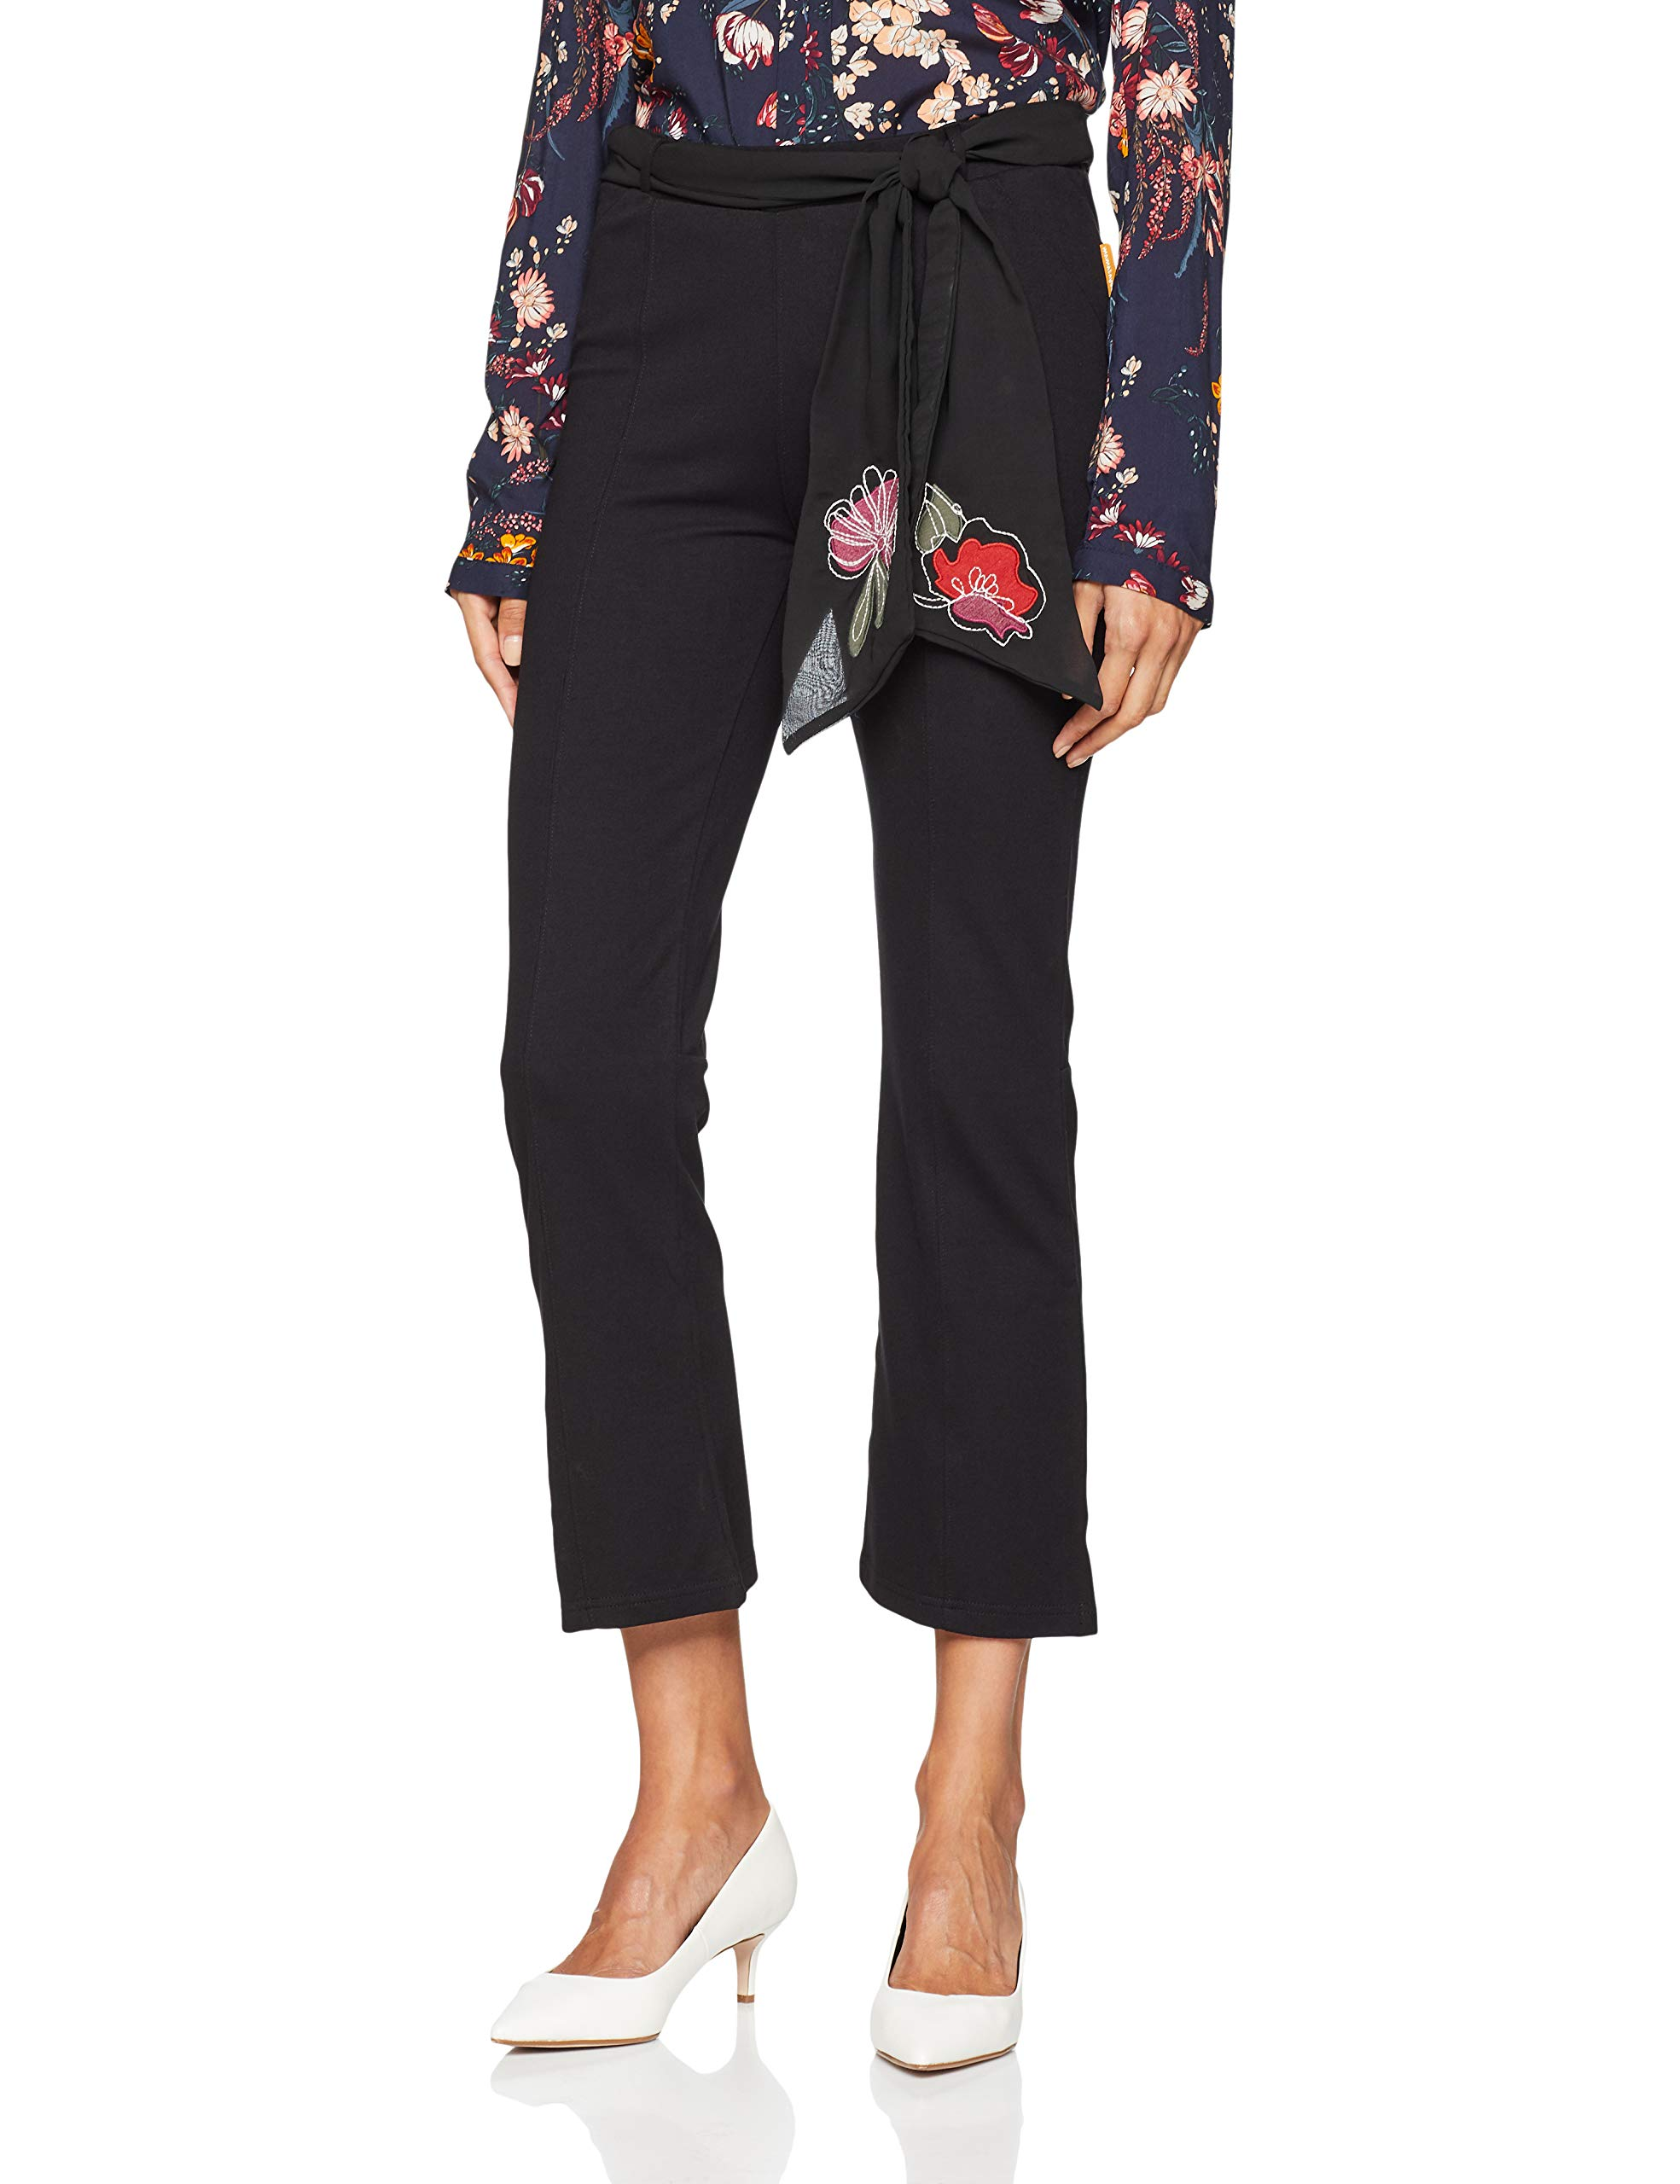 1M Pantalon Noirnegro MamatayoeMmtyoi18055 Femme MamatayoeMmtyoi18055 f6bgyvY7